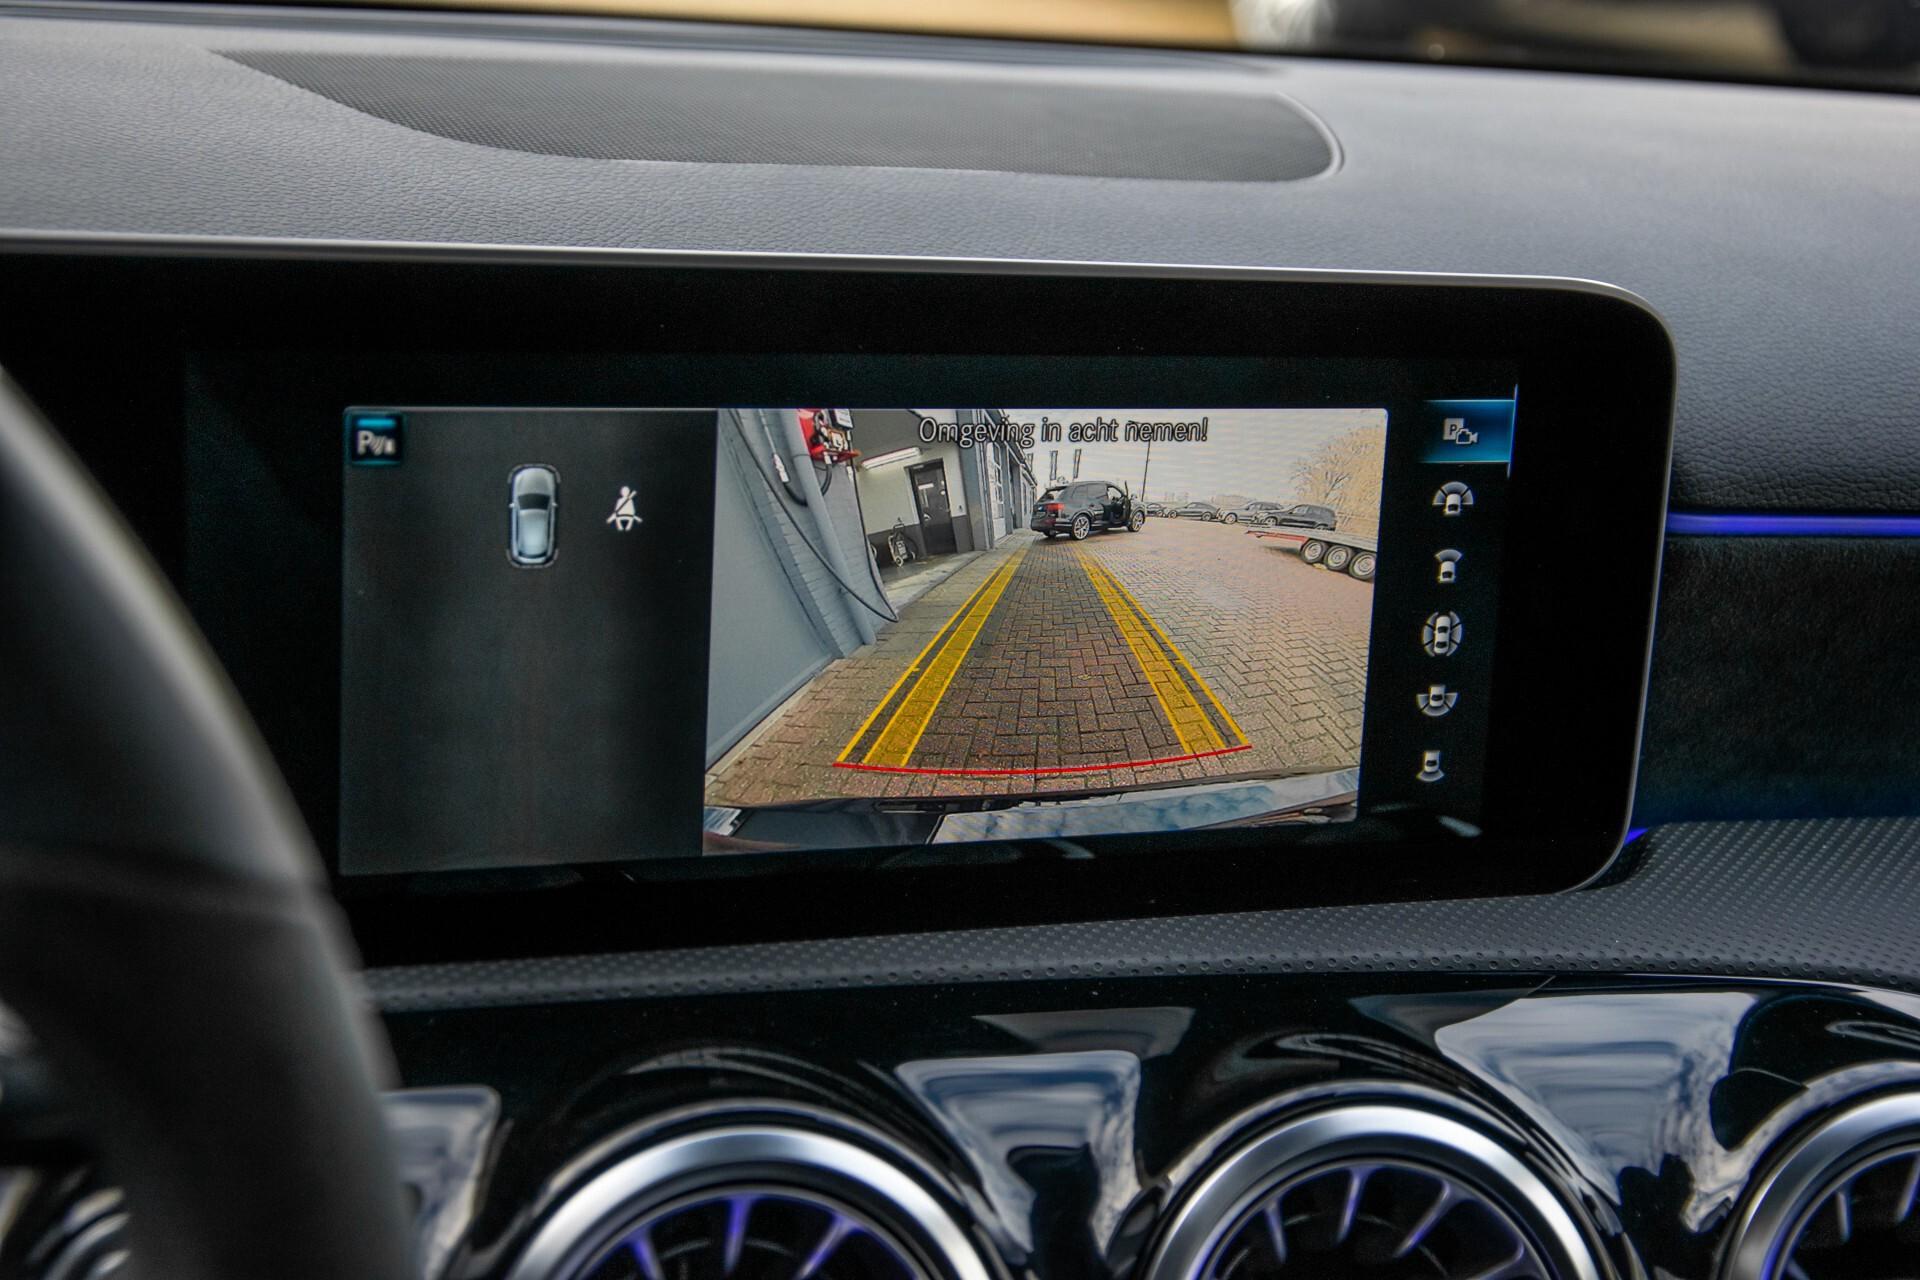 Mercedes-Benz A-Klasse 250 4-M AMG Panorama/Keyless-Entry/MBUX/HUD/Burmester/360/Multibeam LED Aut7 Foto 27